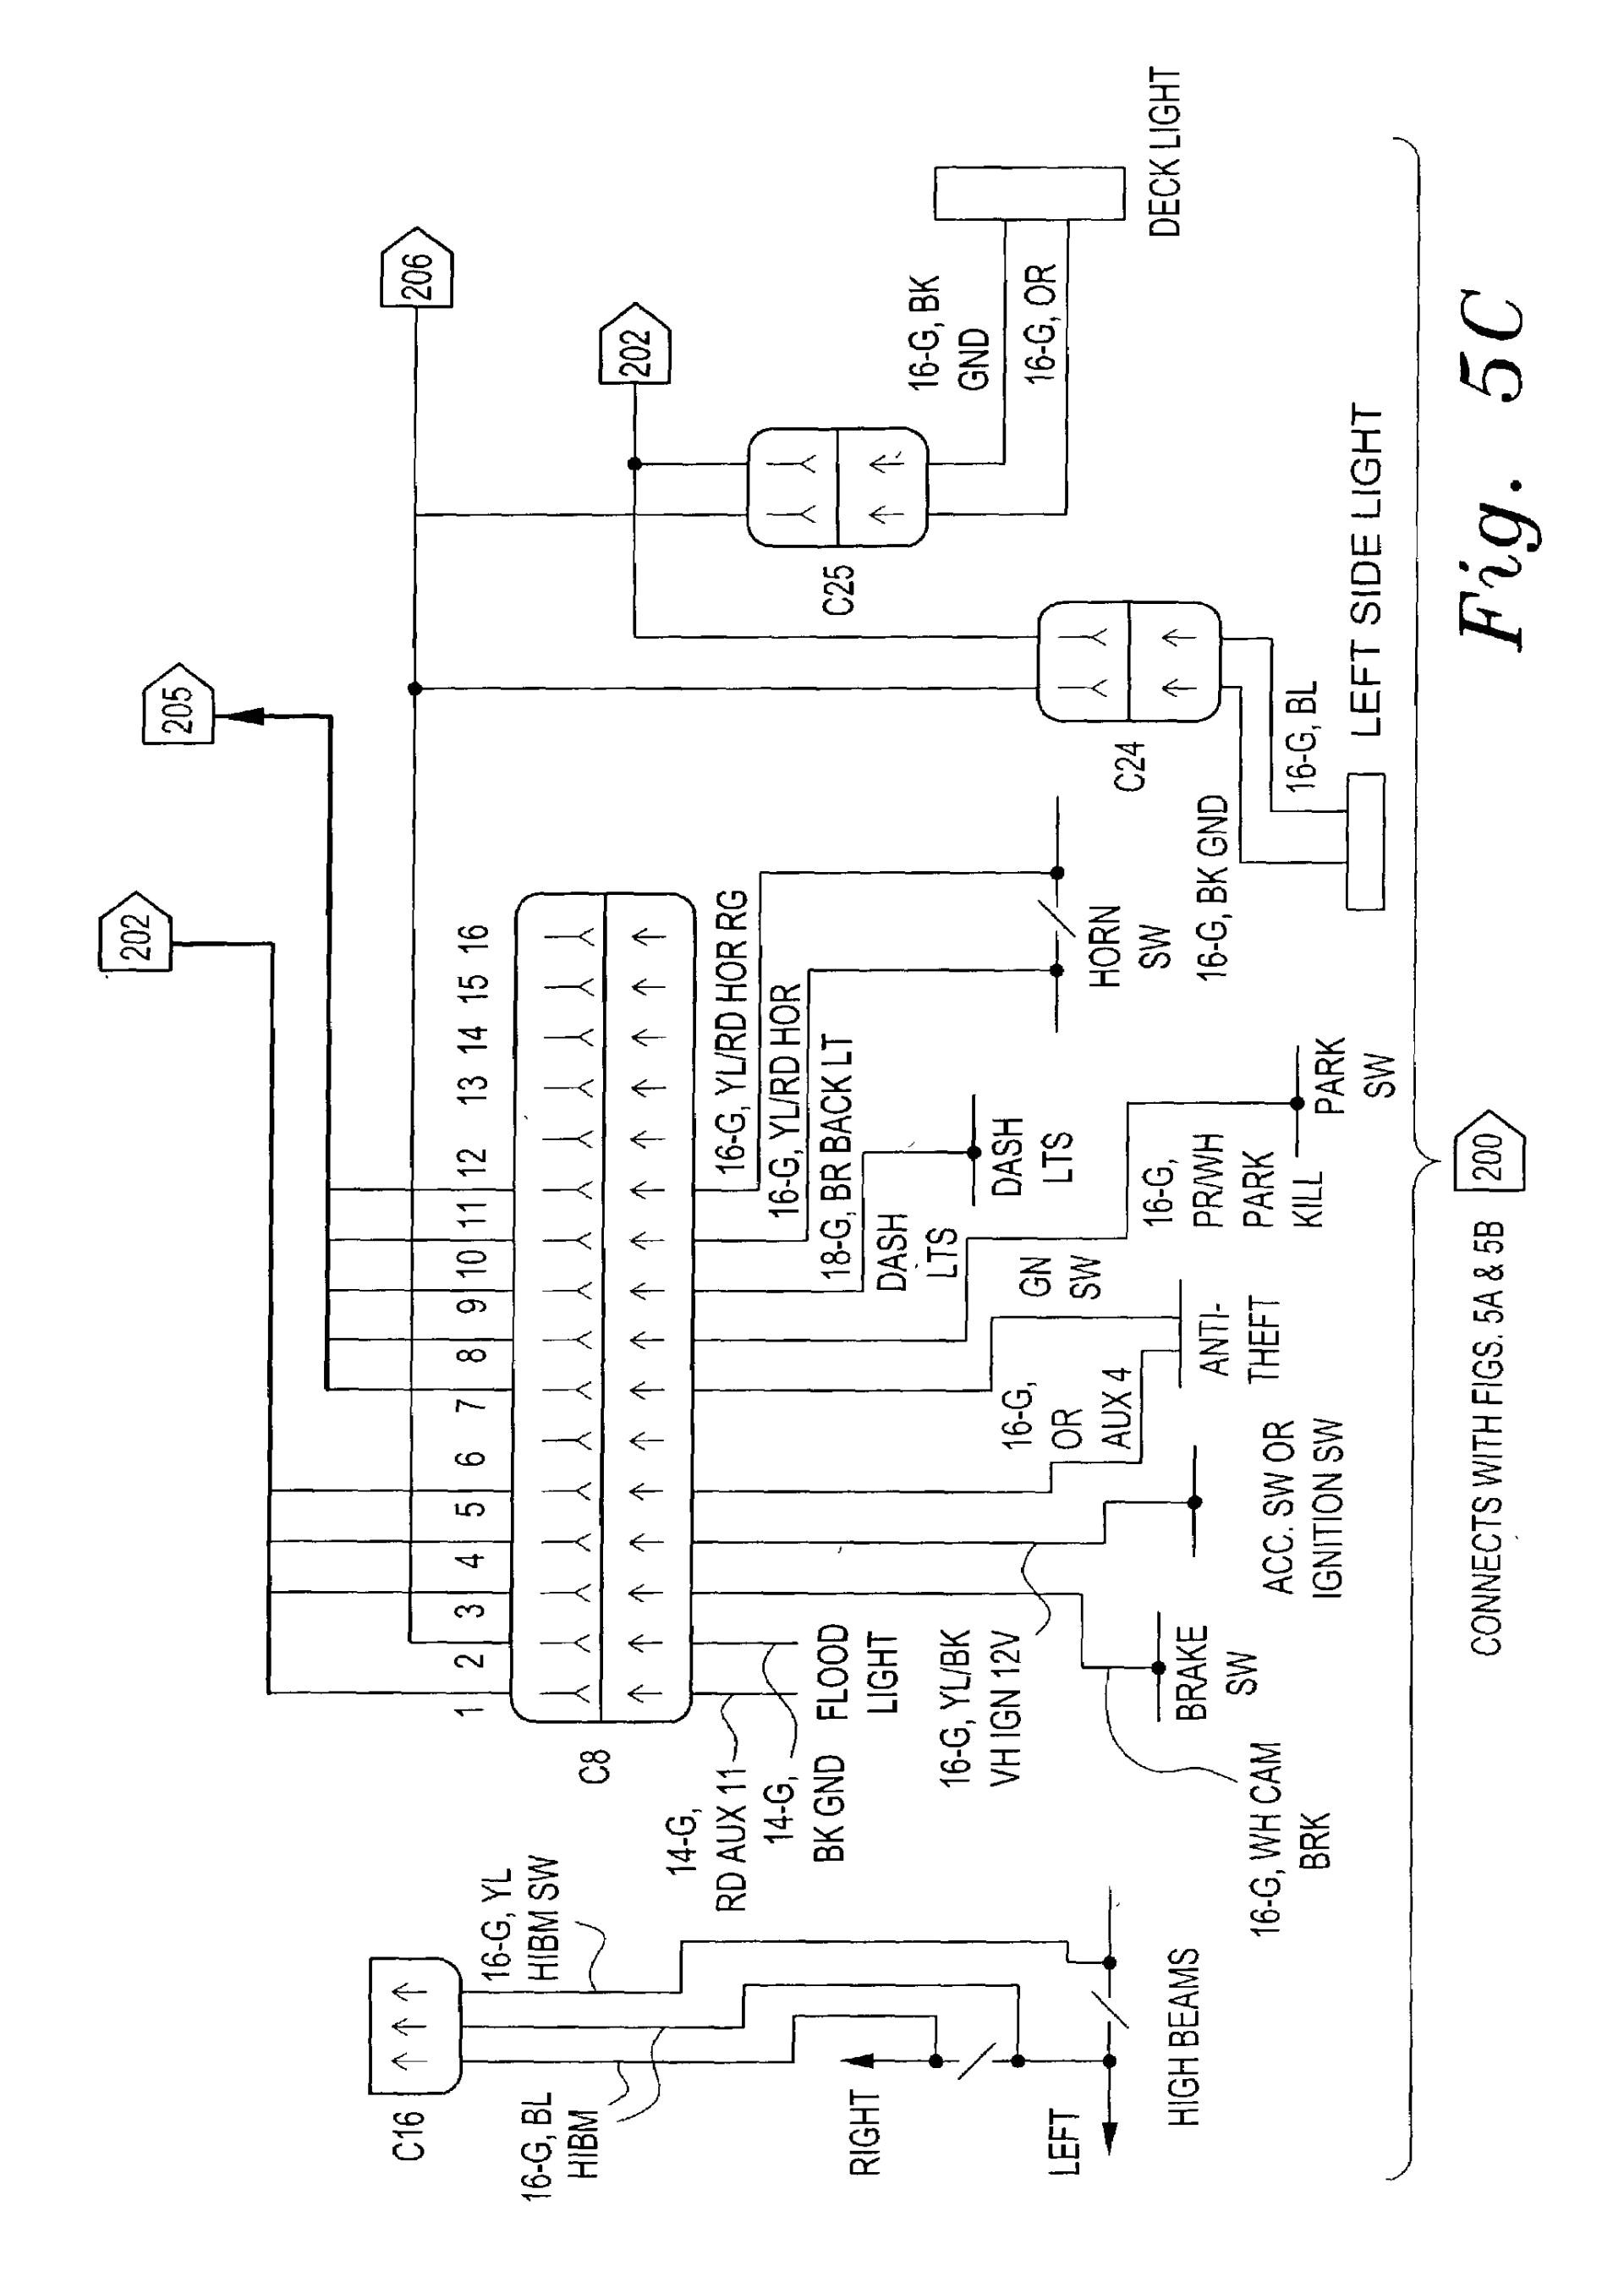 code 3 siren wiring diagram electrical schematic wiring diagram code 3 3672l4 wiring diagram electrical schematic